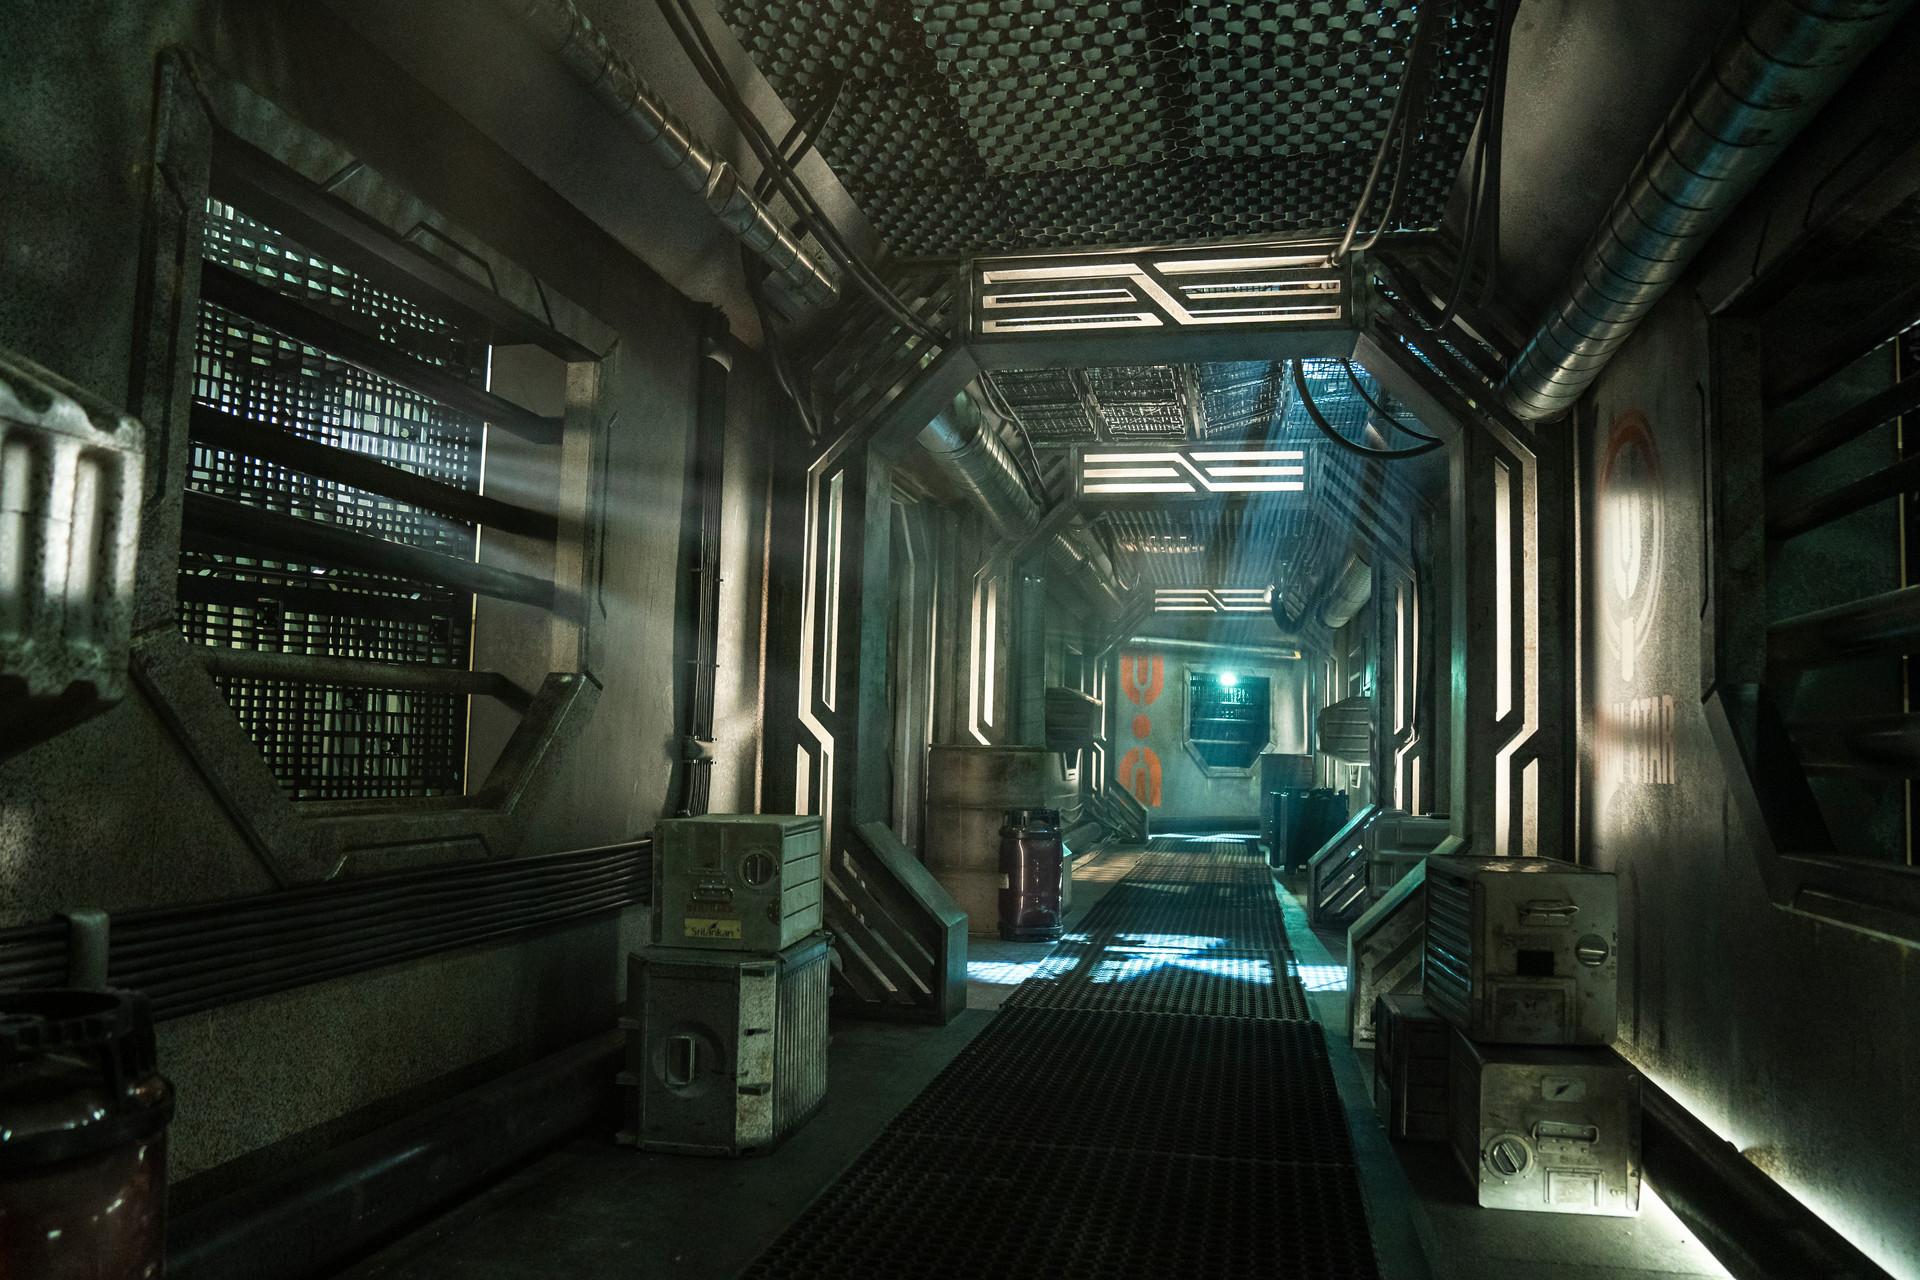 SS Iron Star Corridor